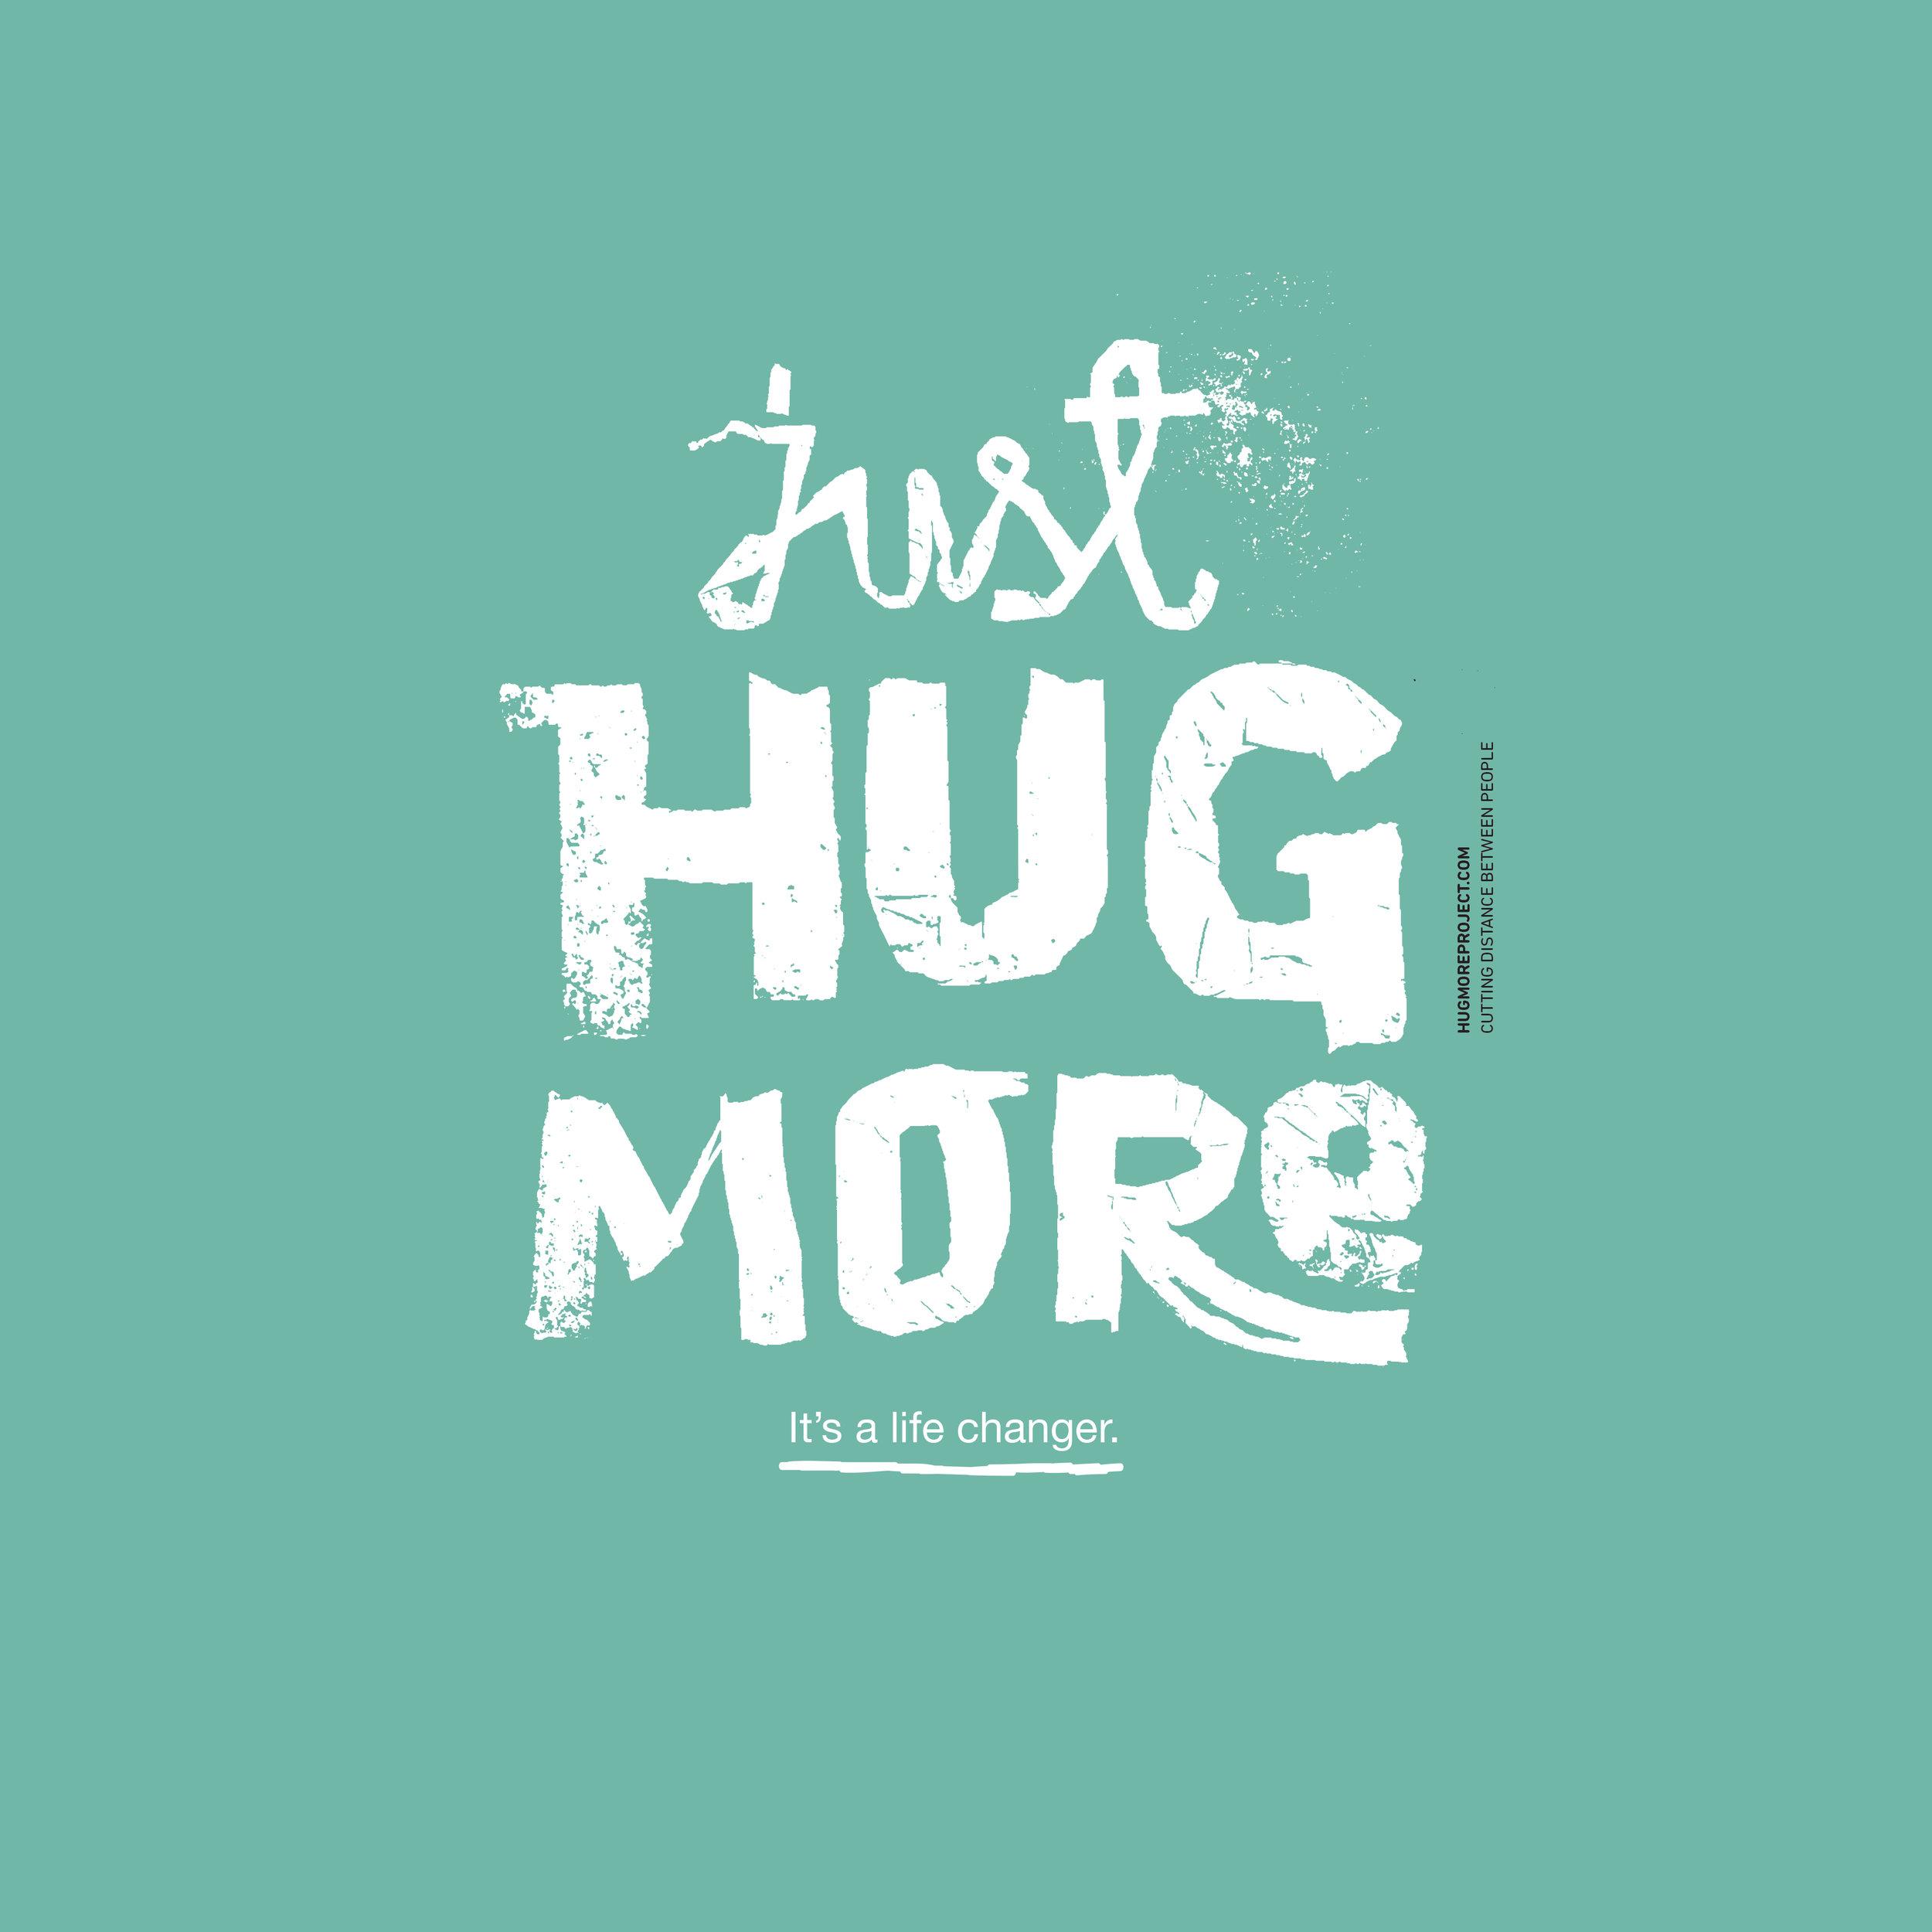 just-hug-more-typo-016.jpg